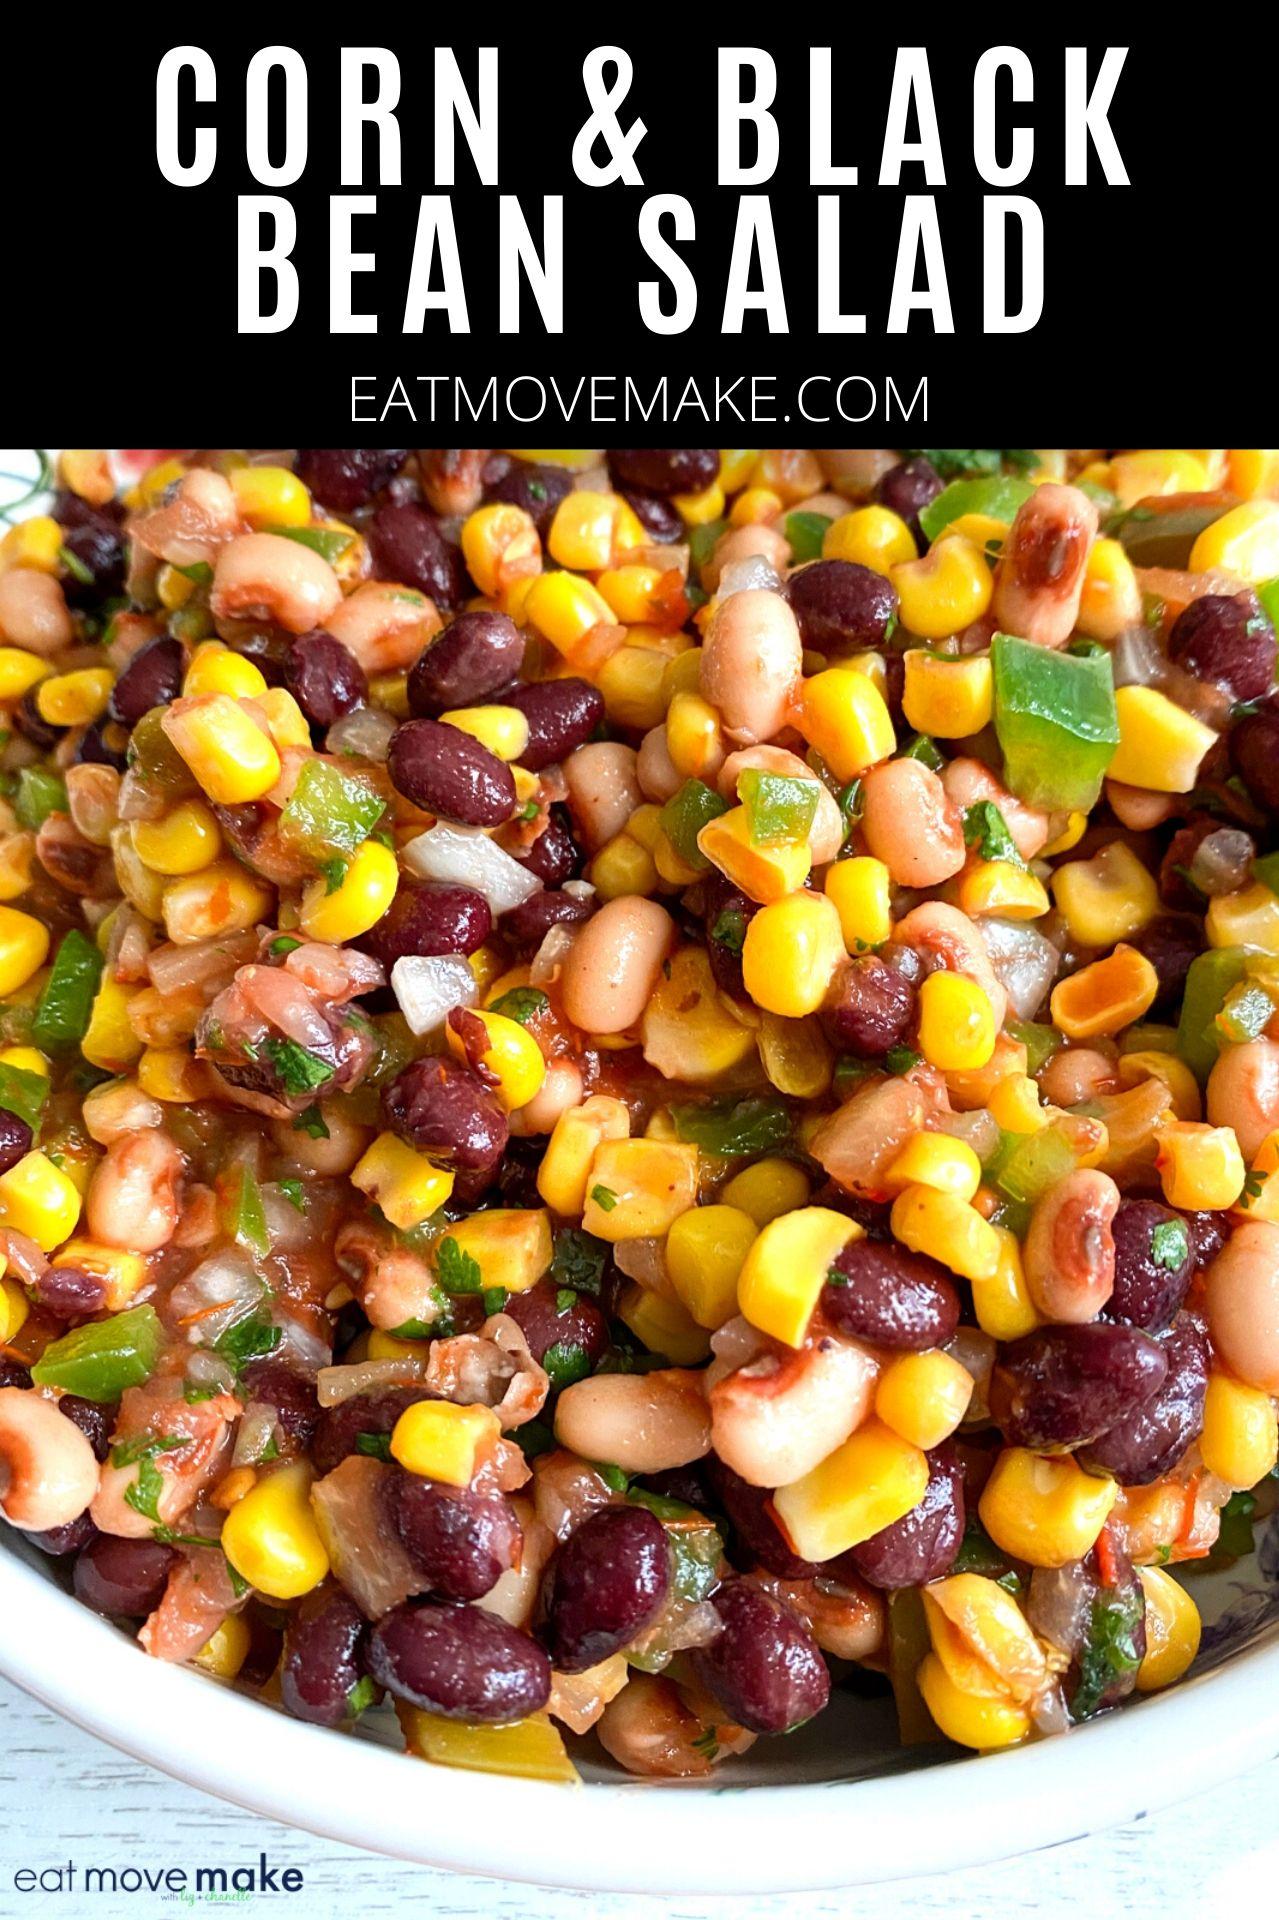 Corn And Black Bean Salad In 2020 Bean Salad Recipes Black Bean Salad Corn Salad Recipe Easy